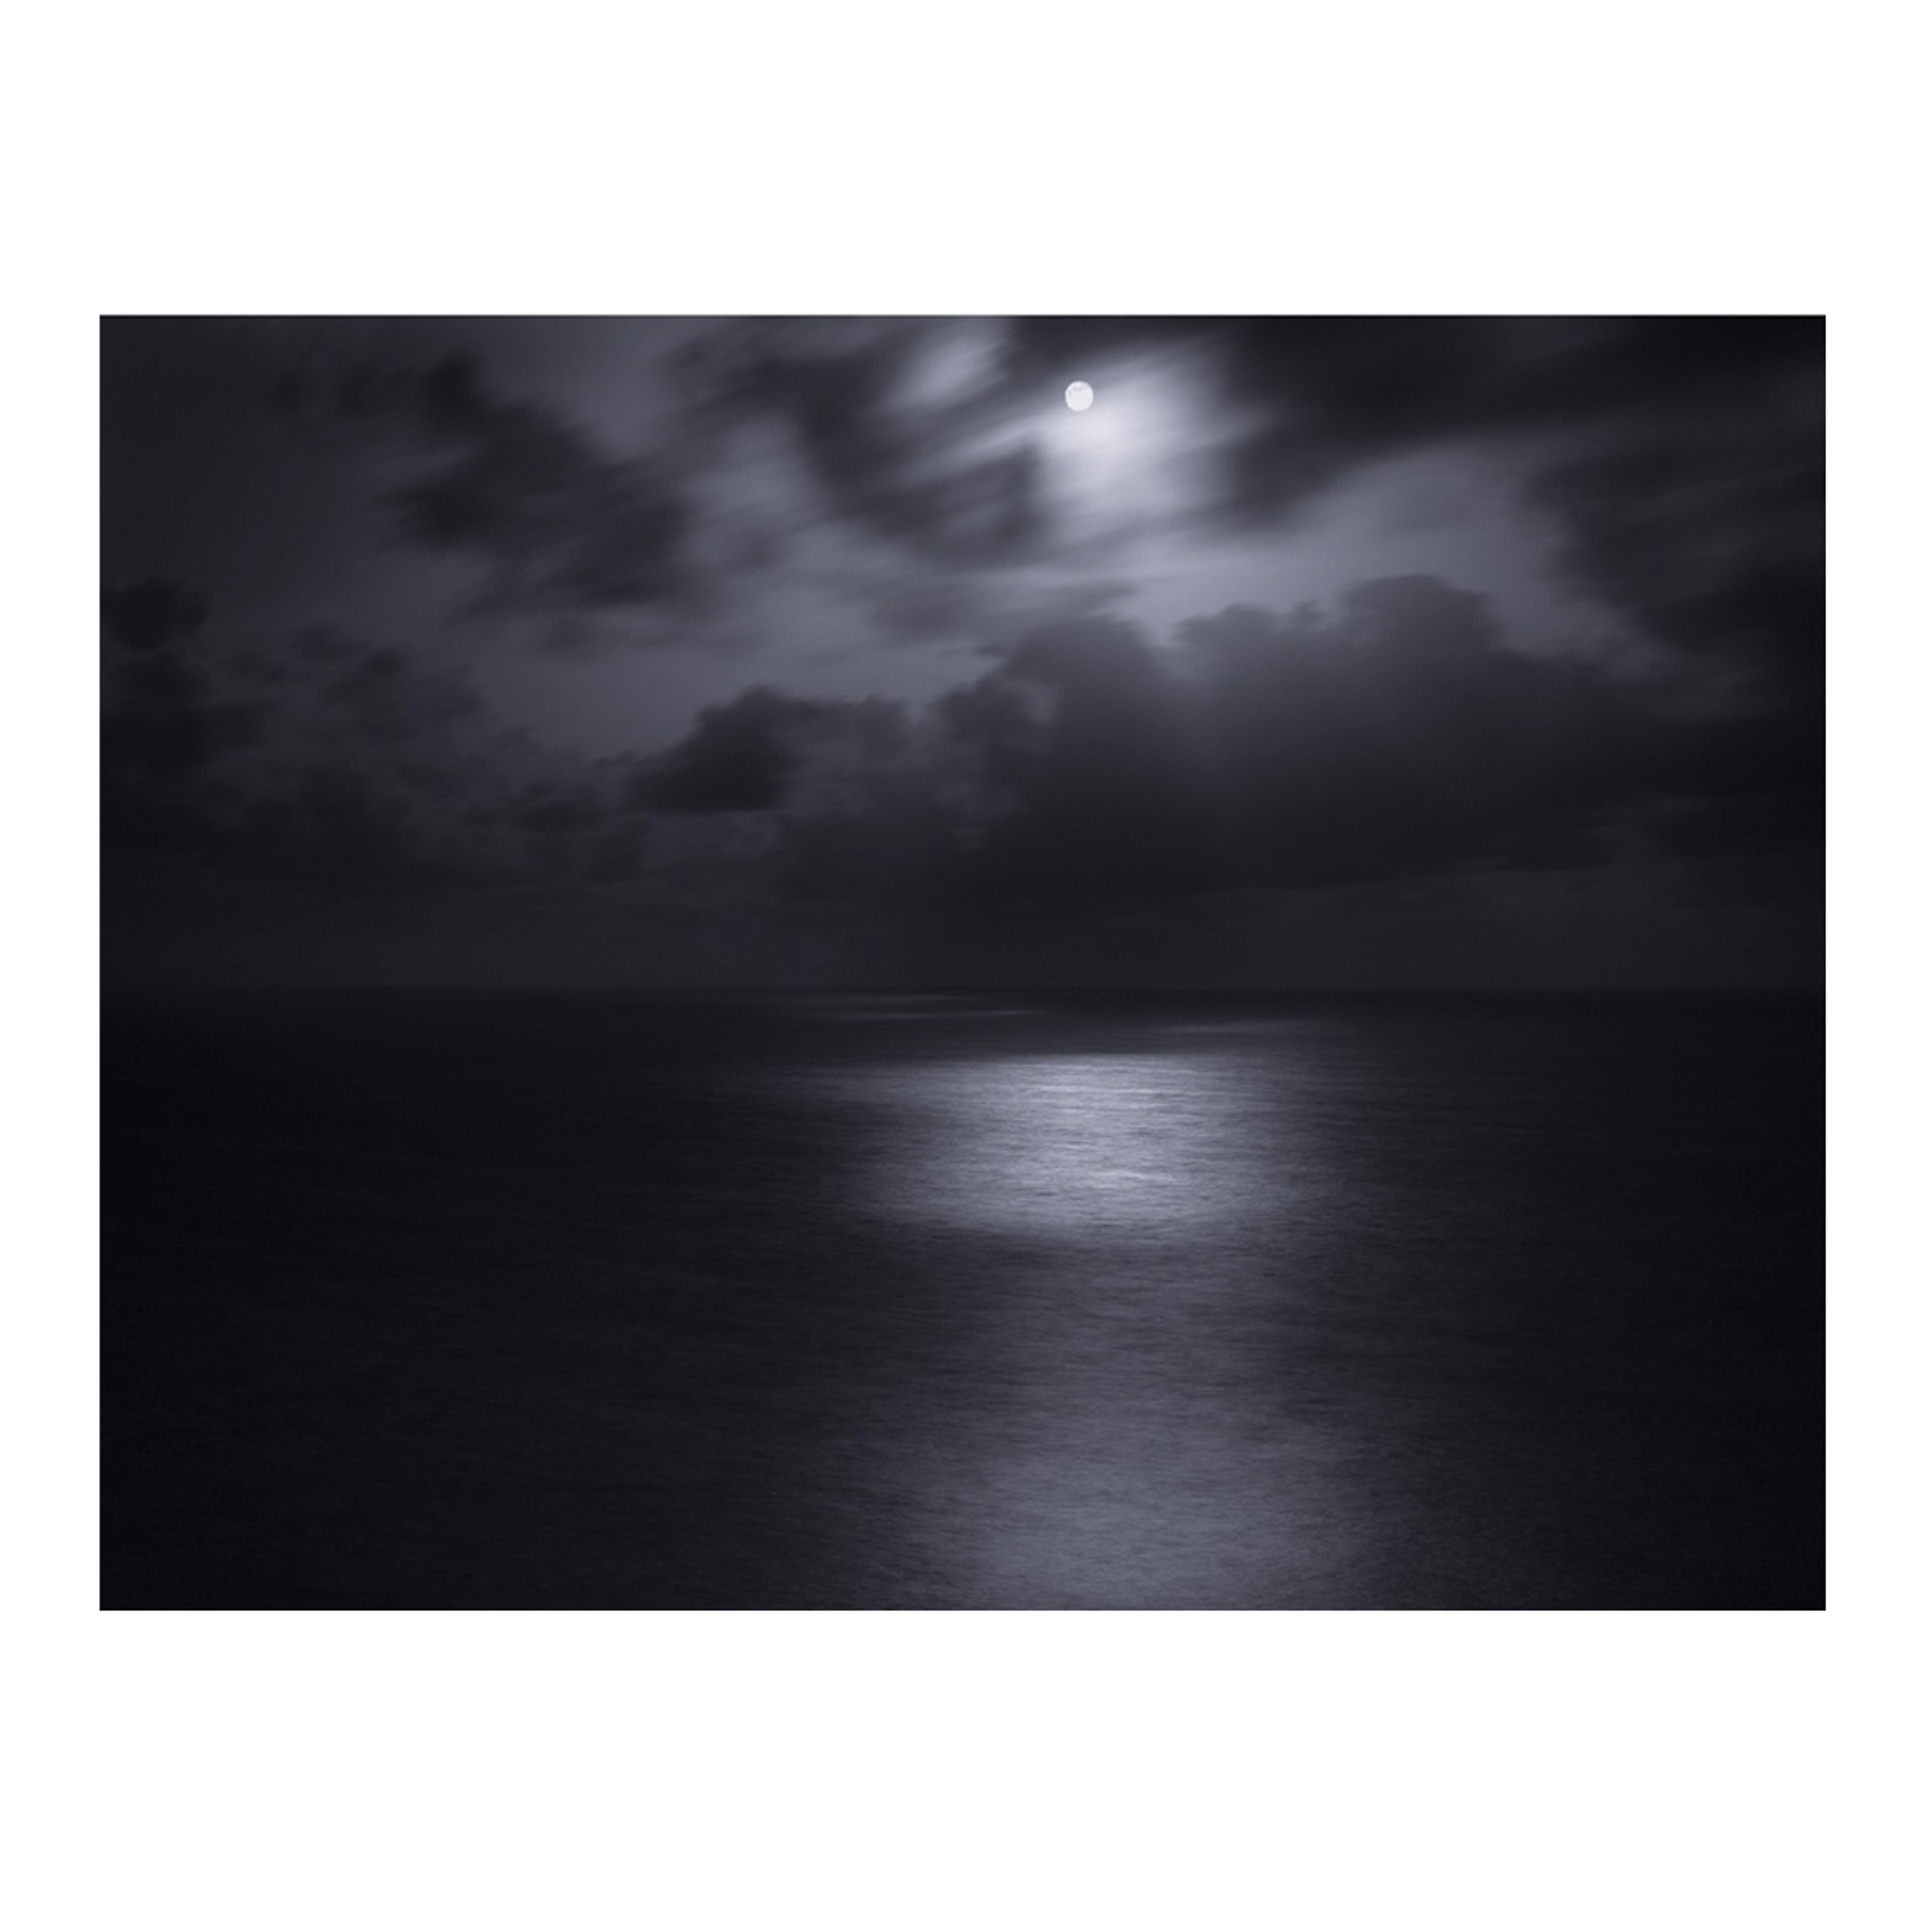 Moonscape #1 by Gabriella Imperatori-Penn